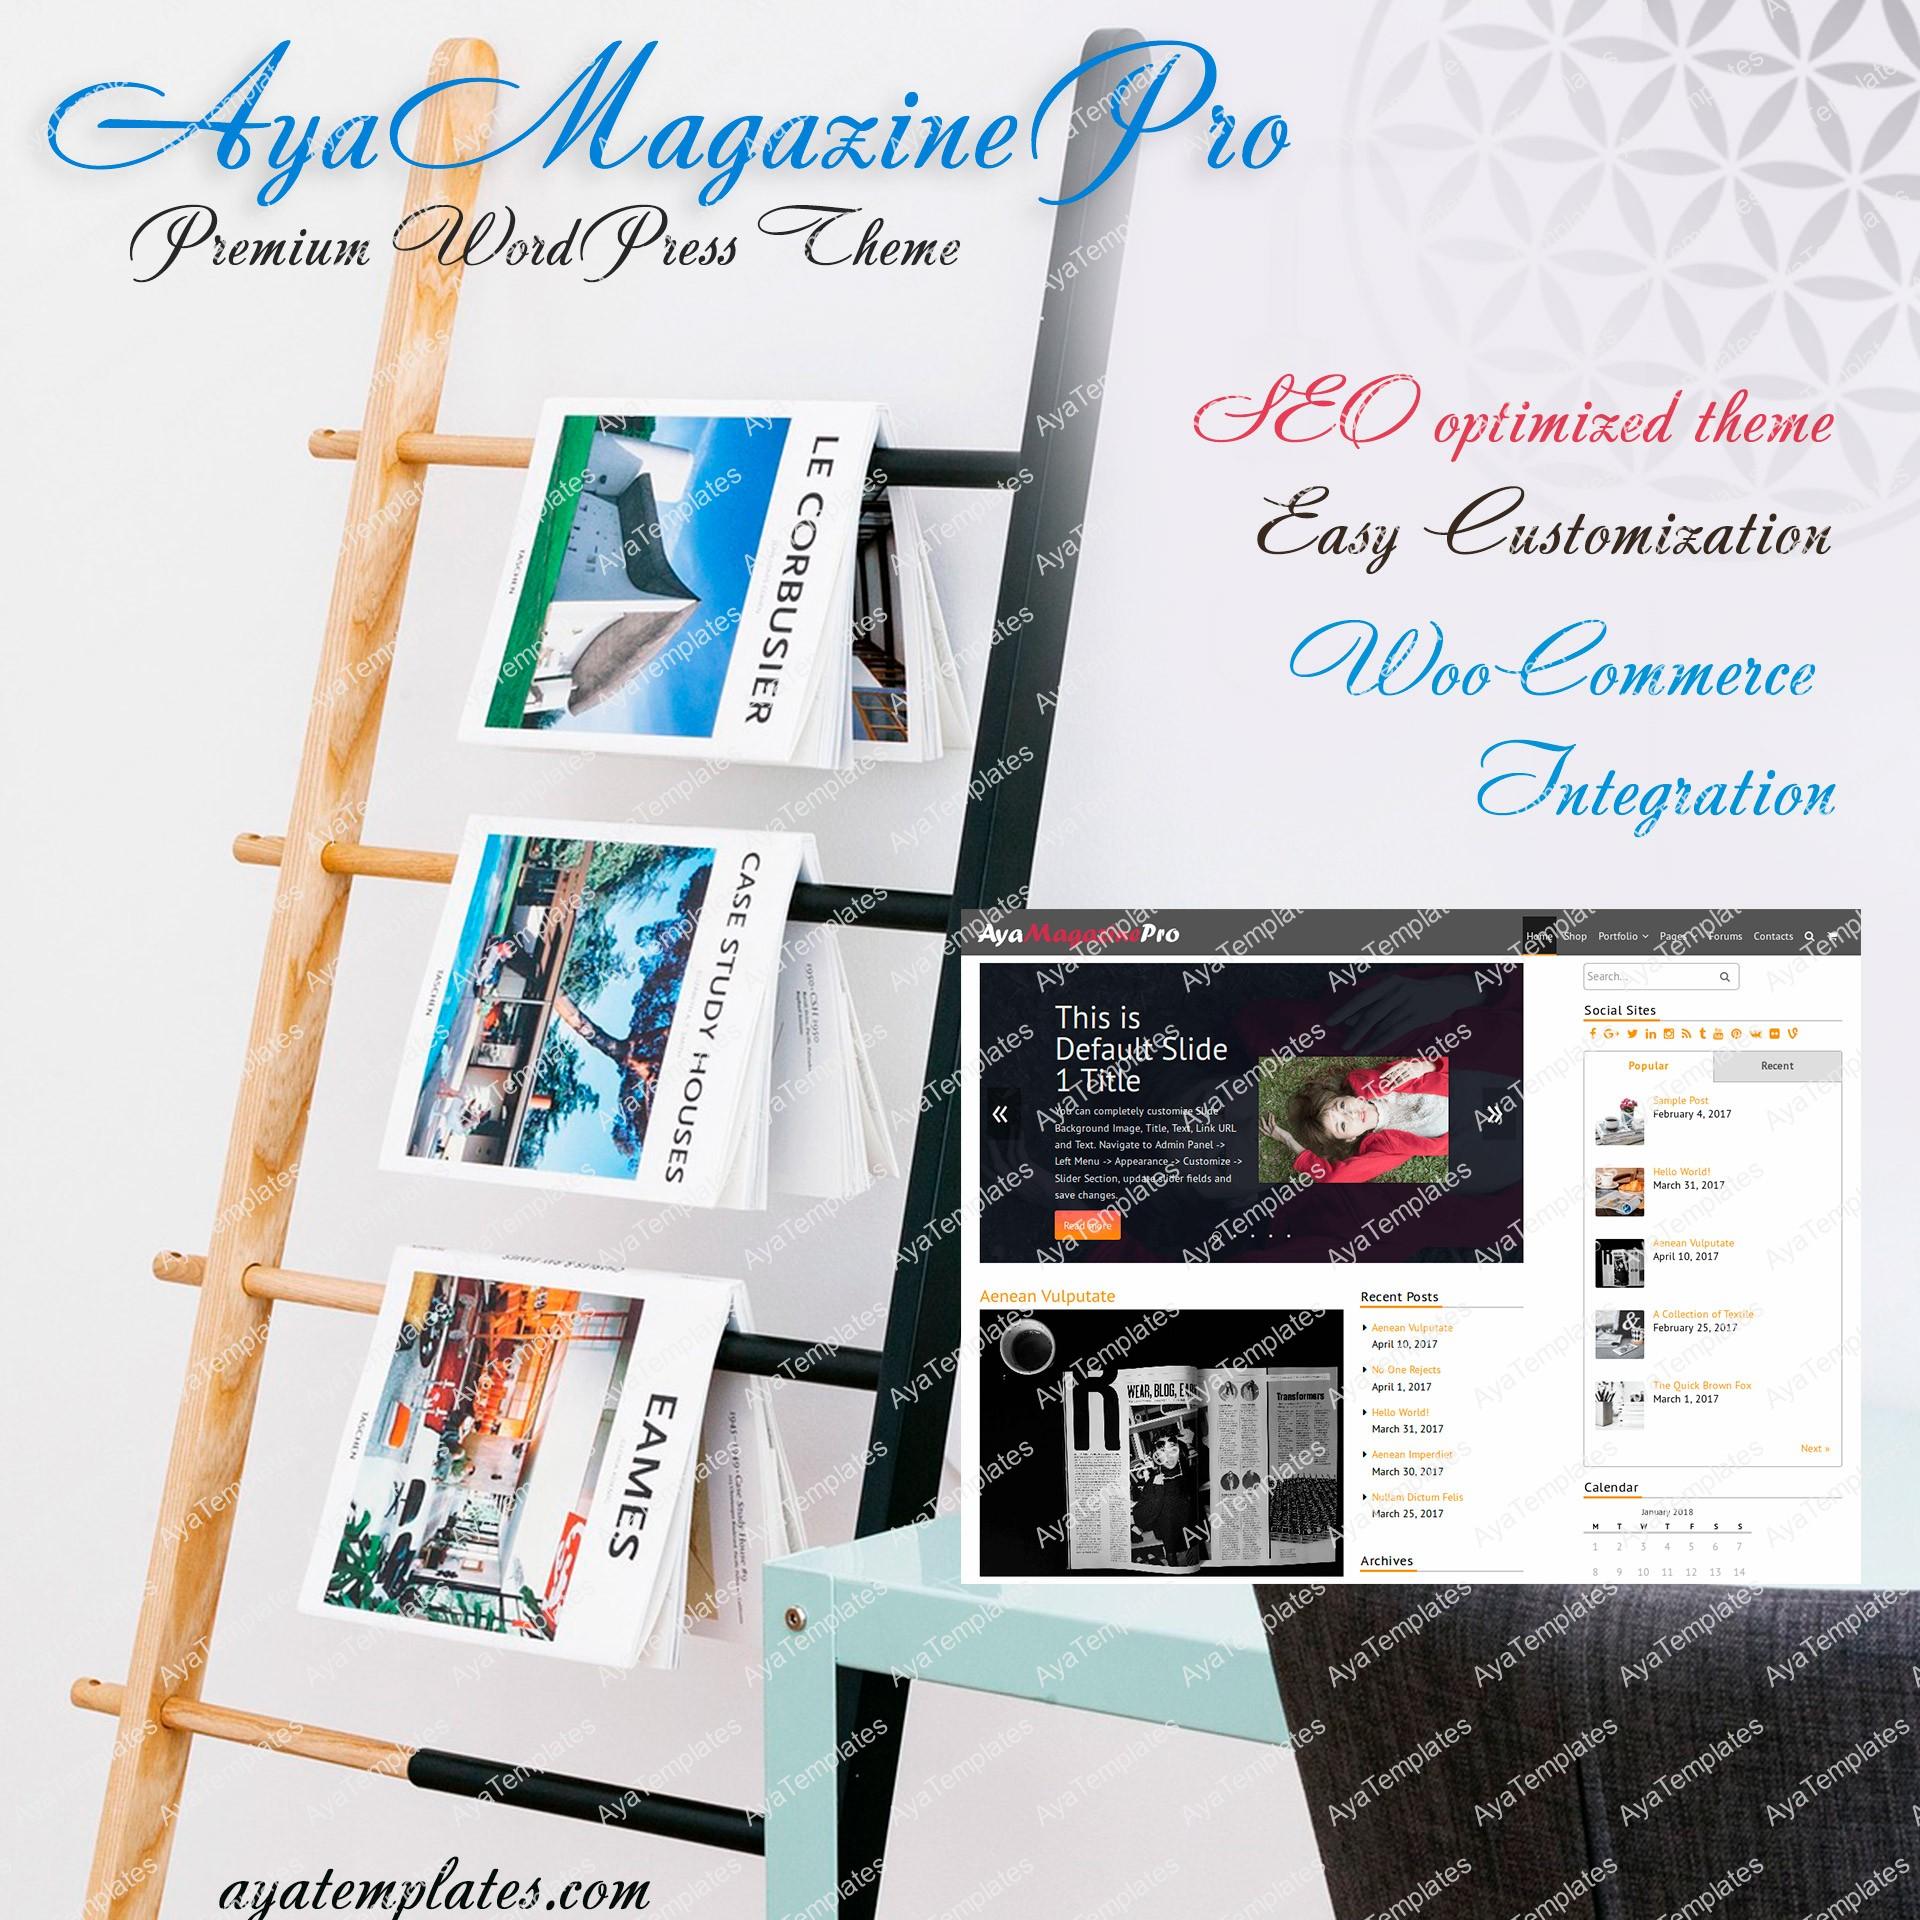 ayamagazinepro-premium-wordpress-theme-mockup-ayatemplates-com